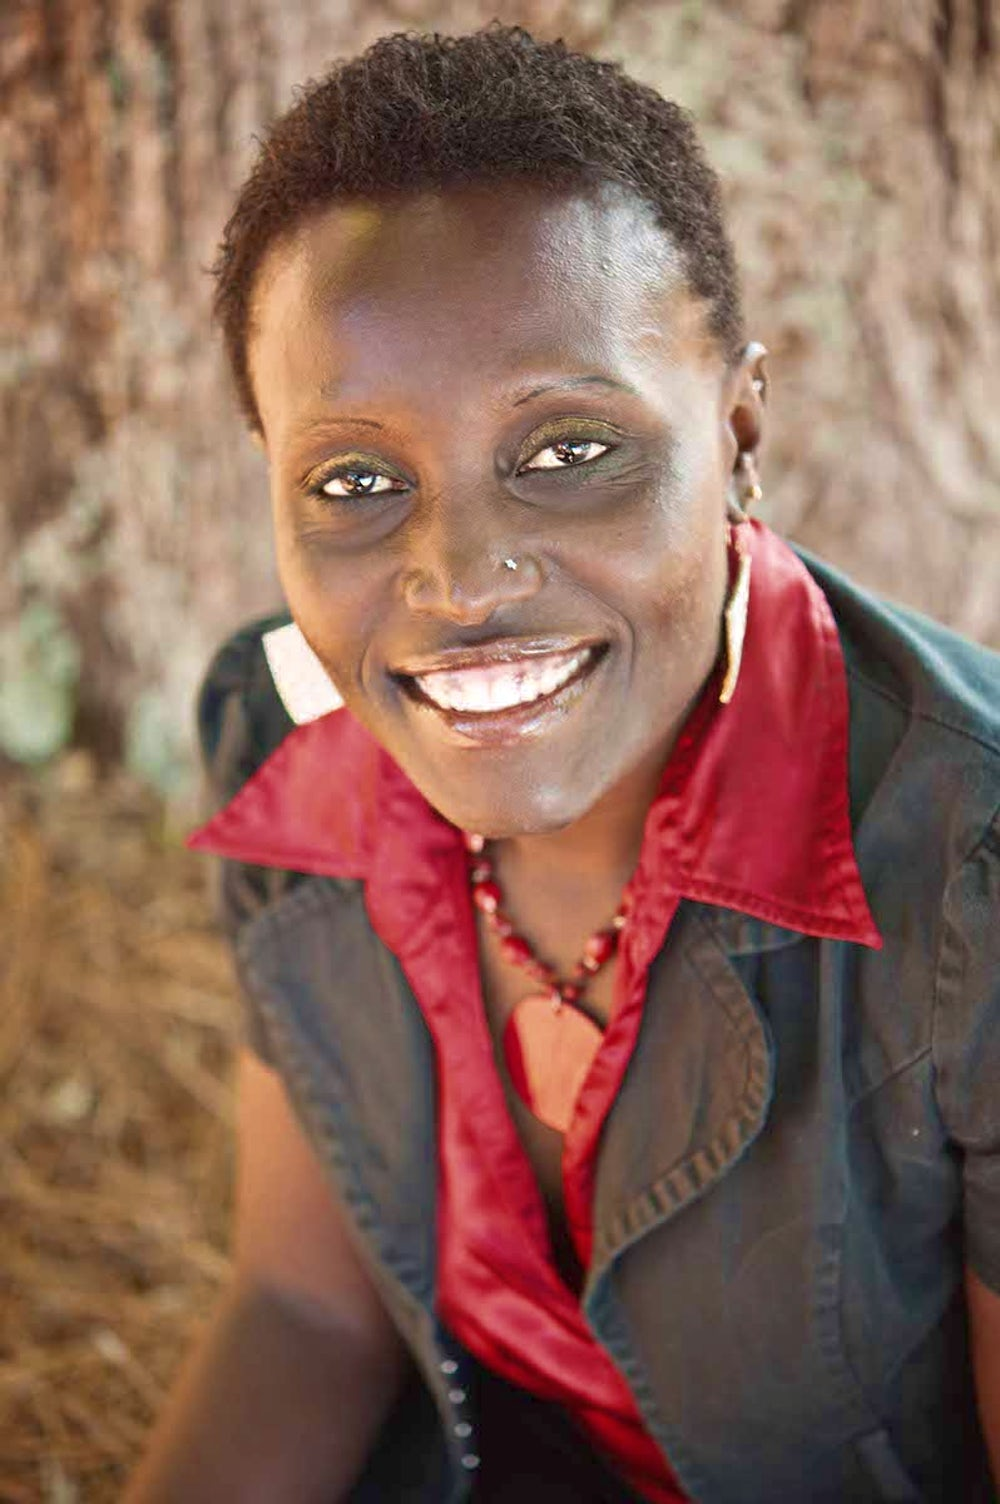 A headshot of Dr. Esther Ngumbi